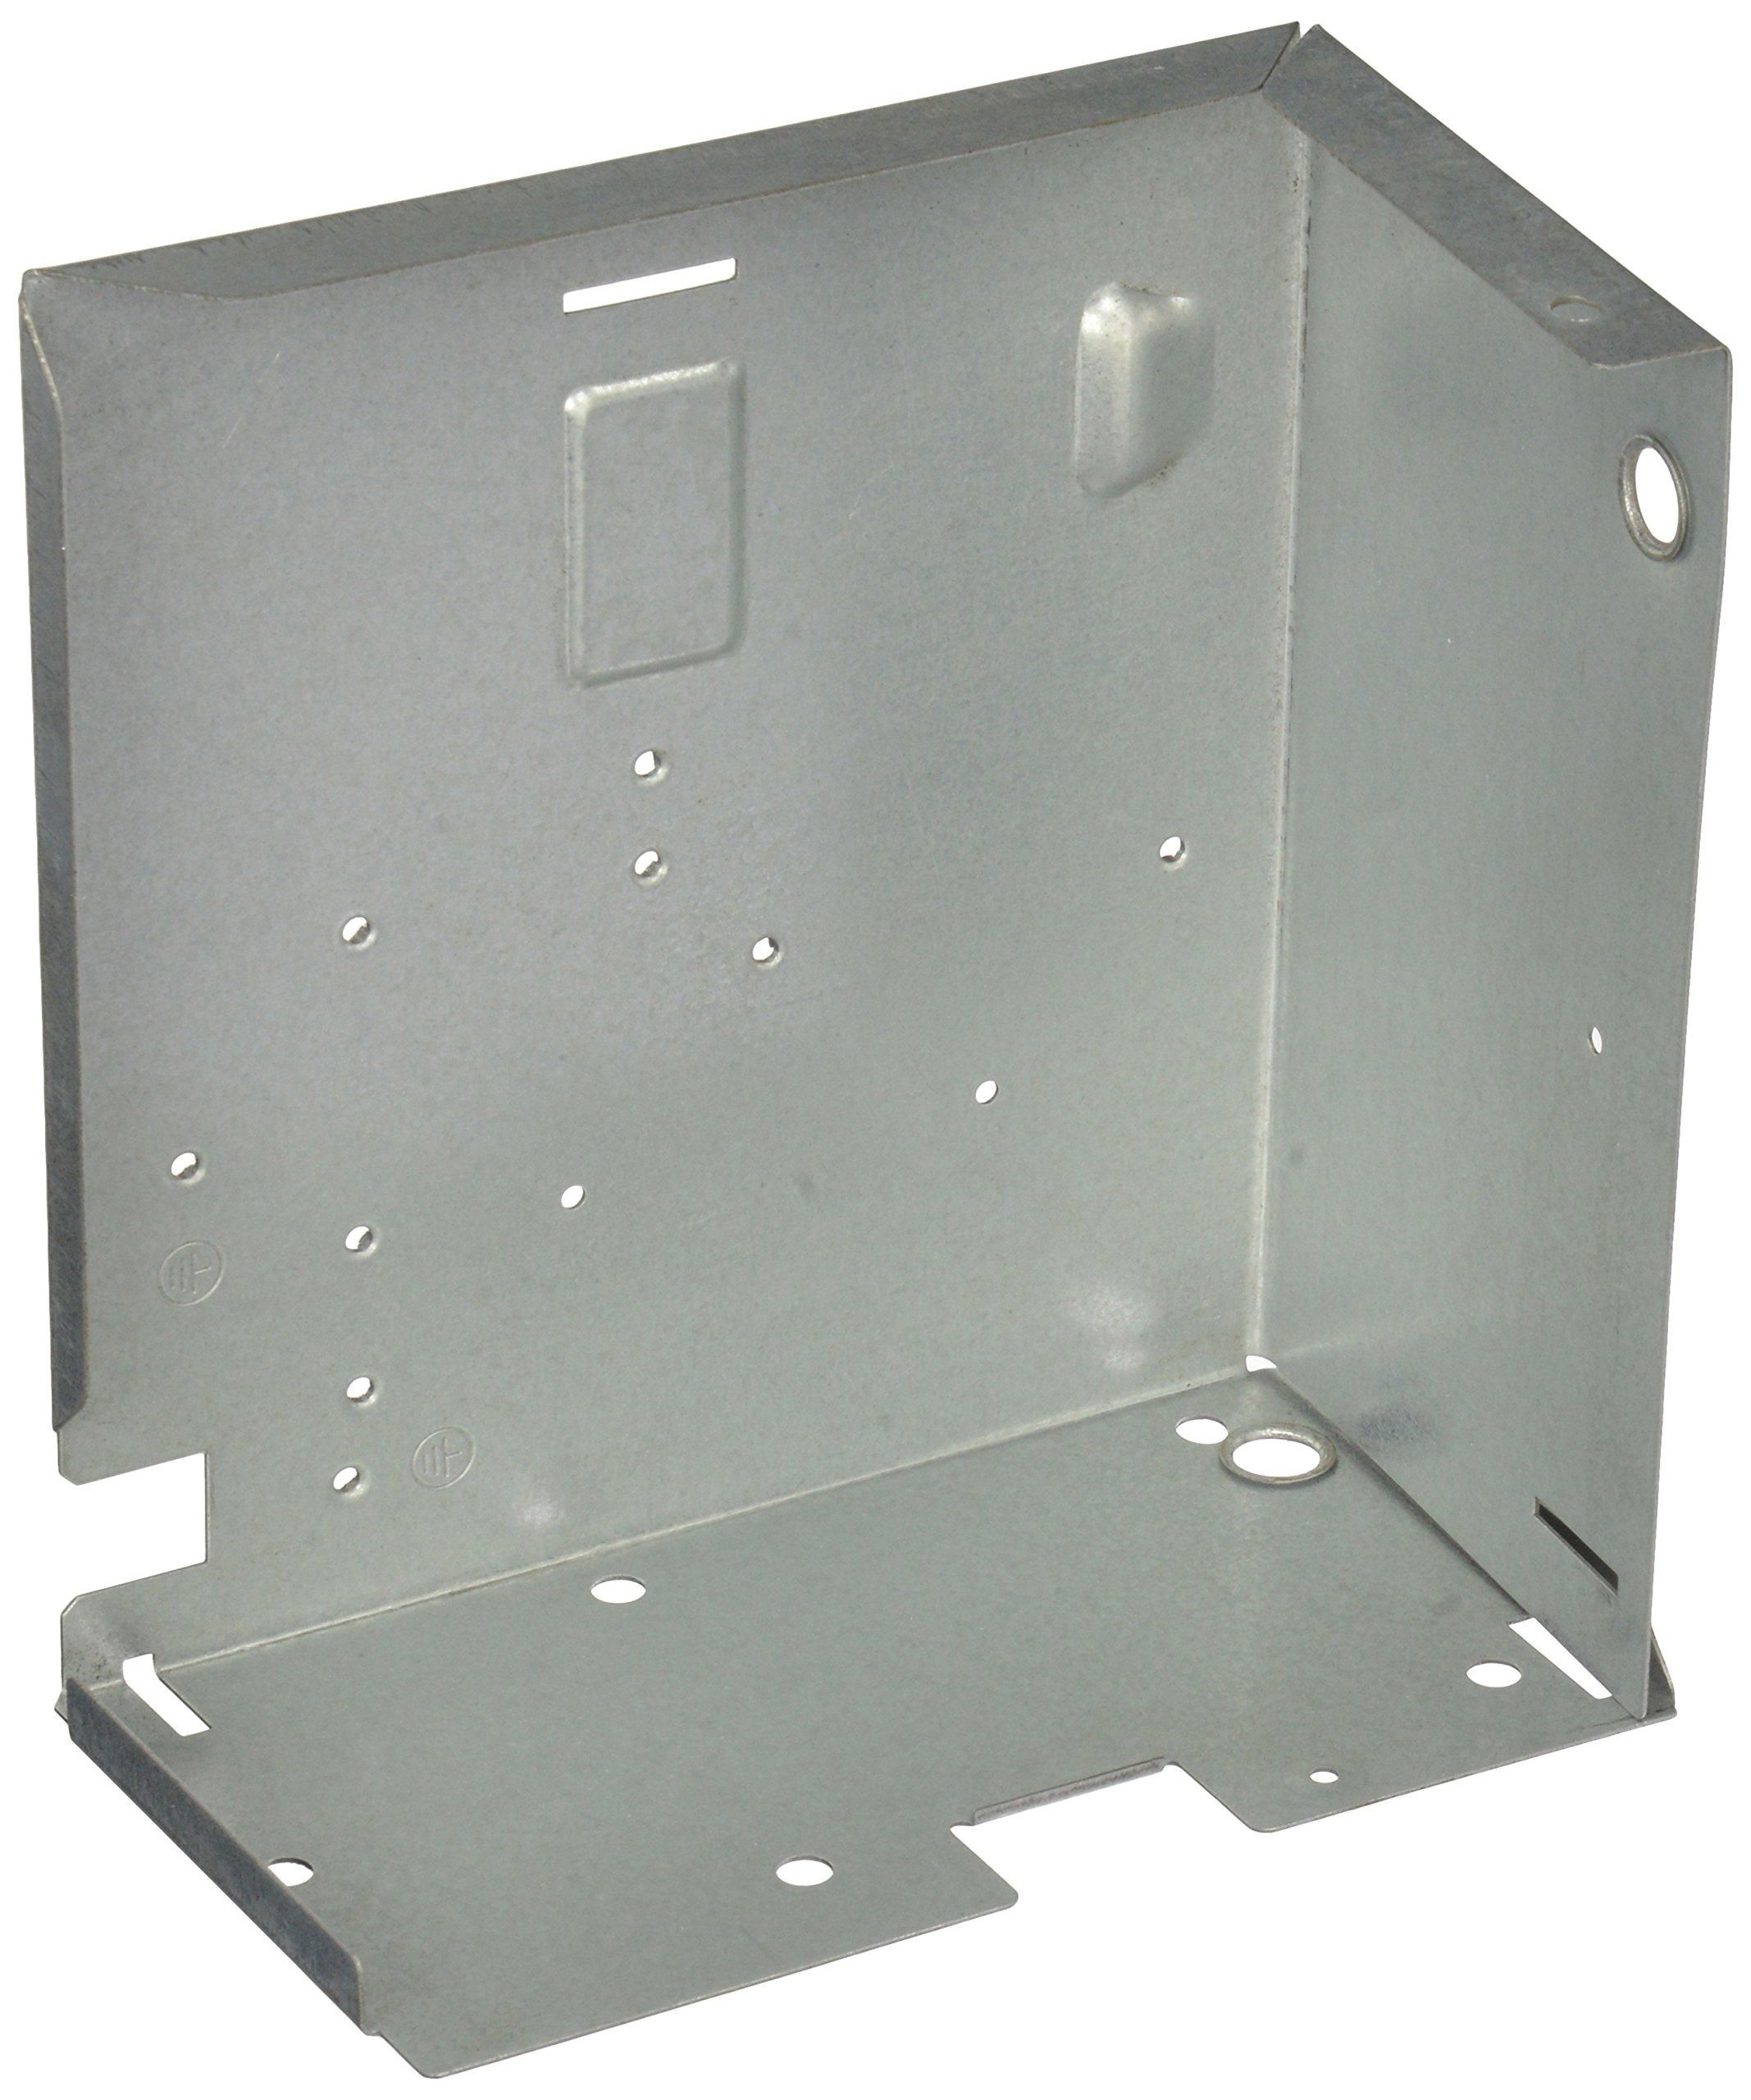 Frigidaire 309630404 Air Conditioner Bracket Unit by Frigidaire